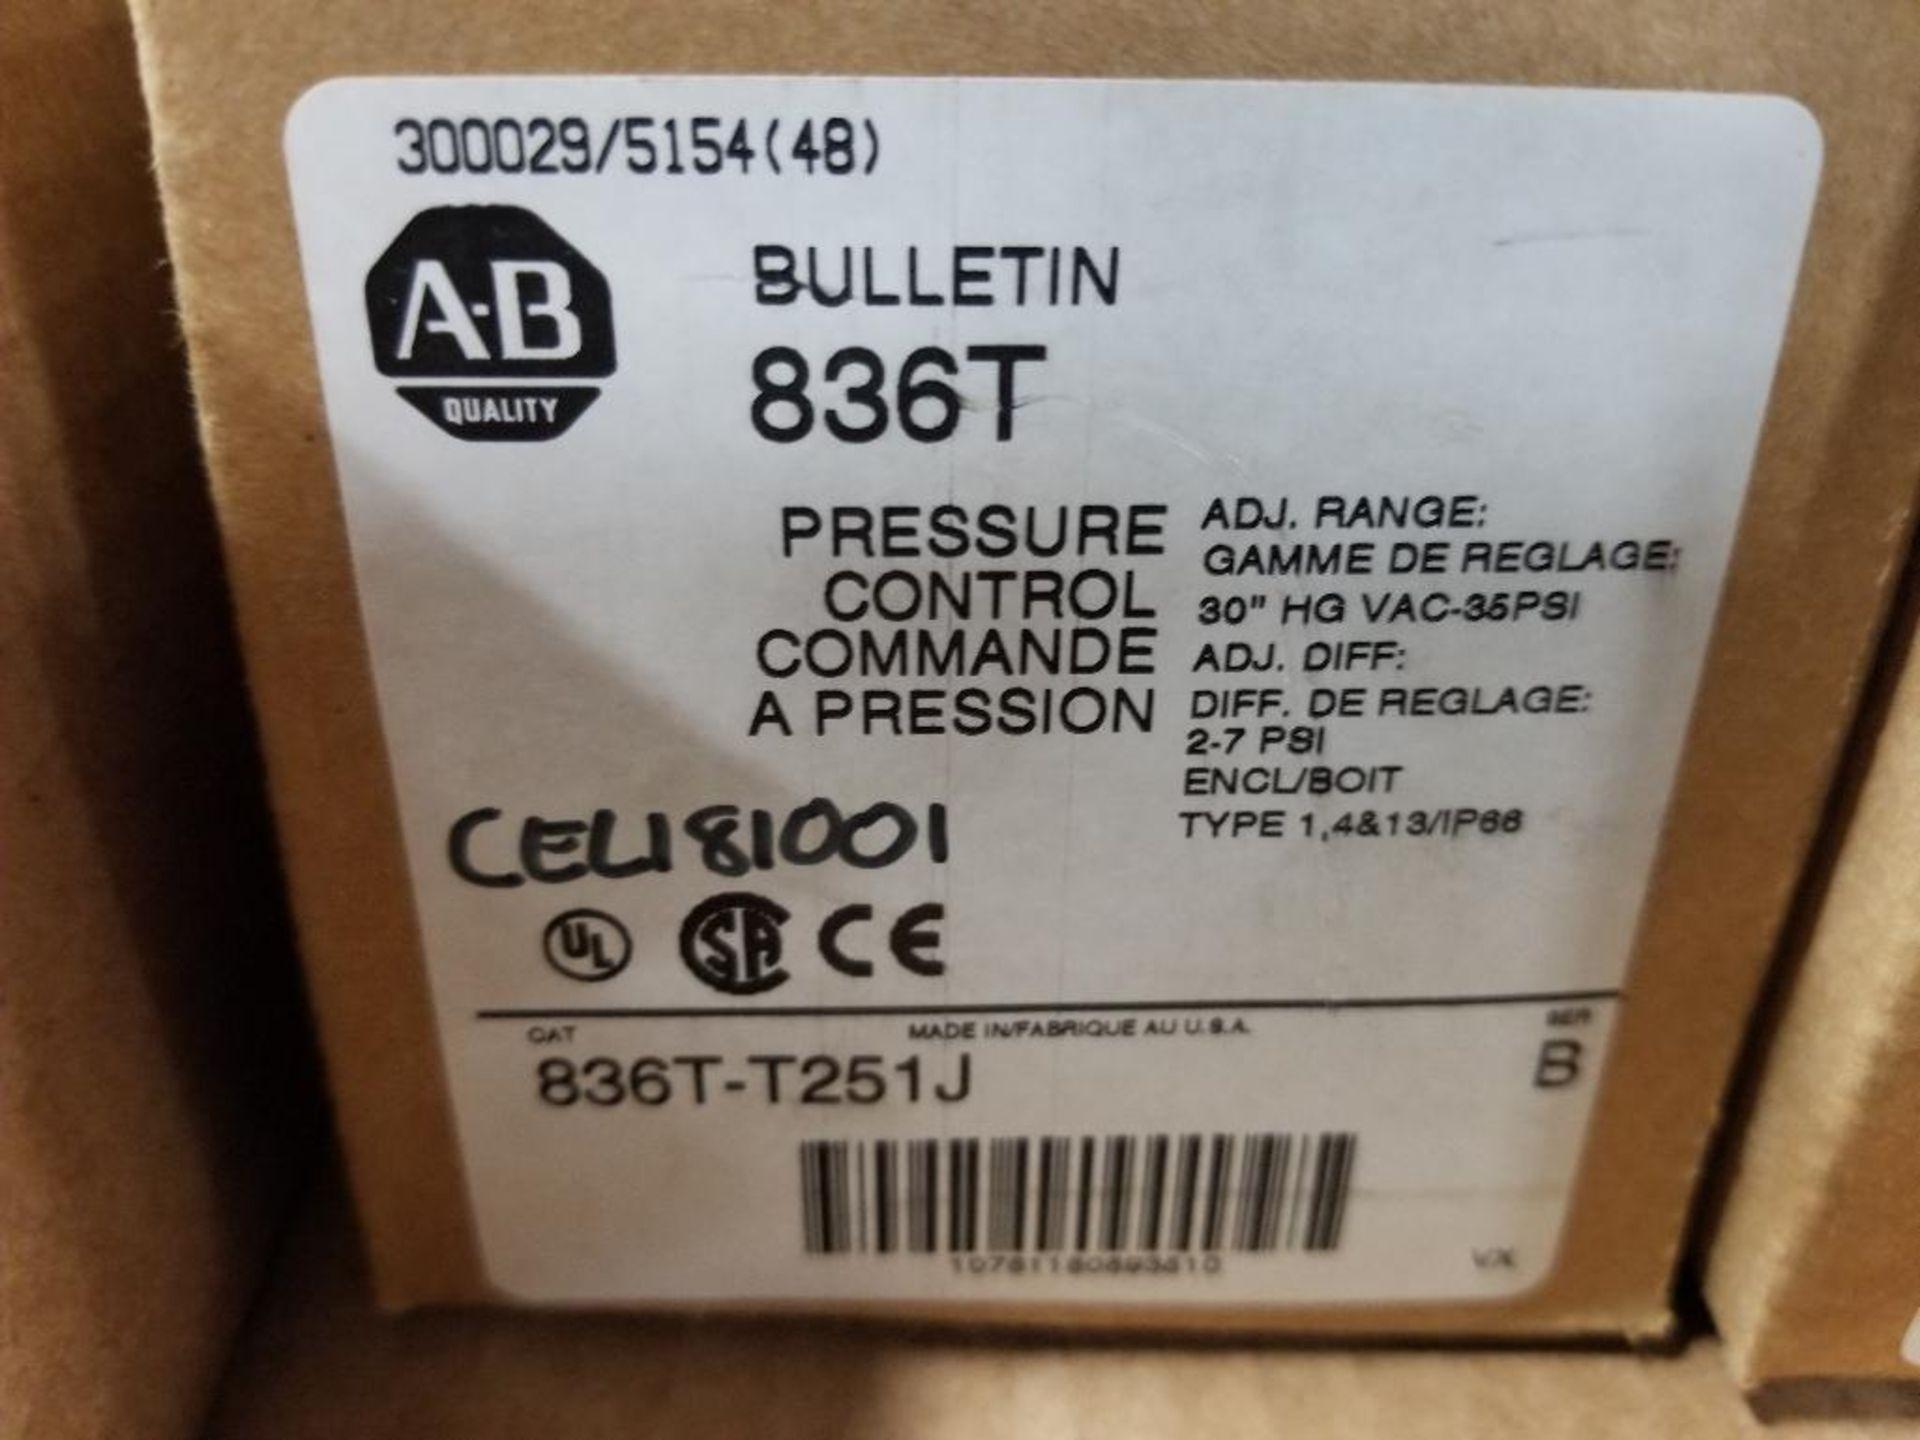 Qty 2 - Allen Bradley 836T-T251J Pressure Control. New in Box. - Image 2 of 3